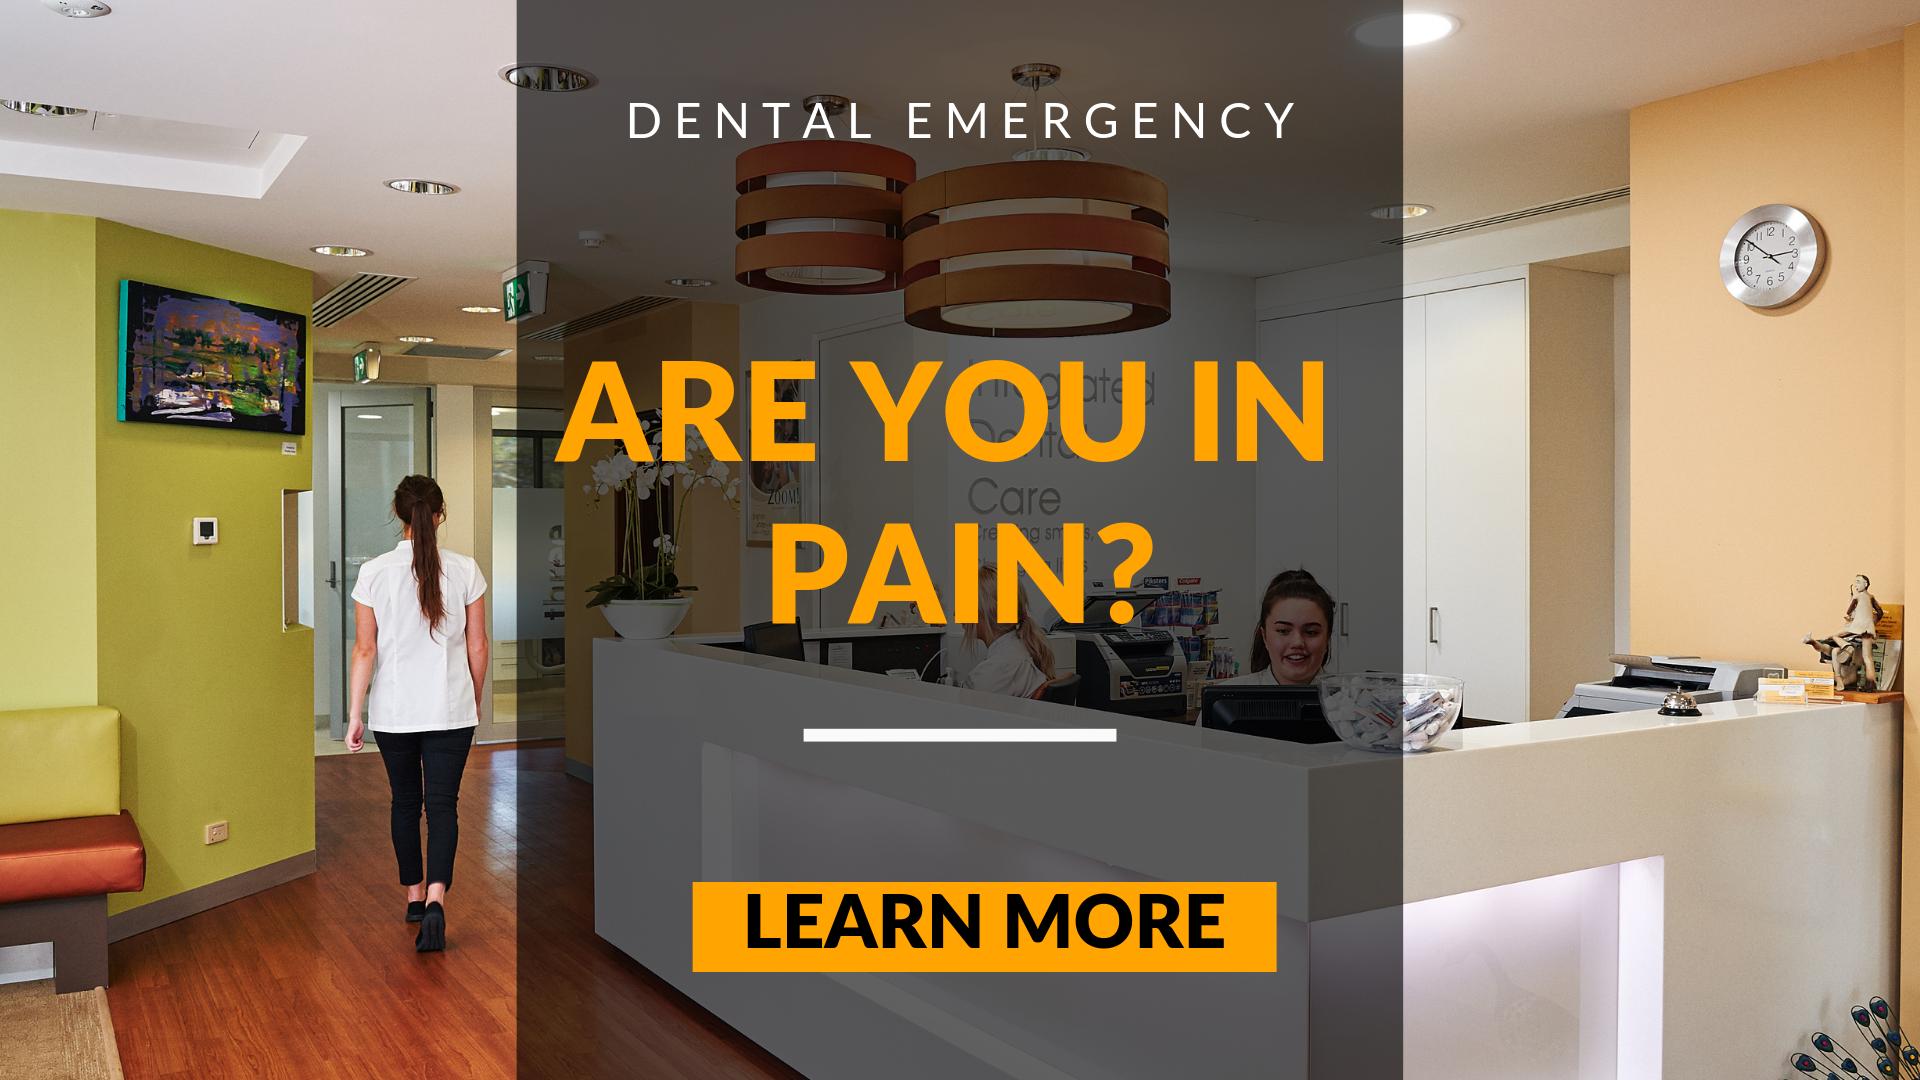 dental emergency in pain